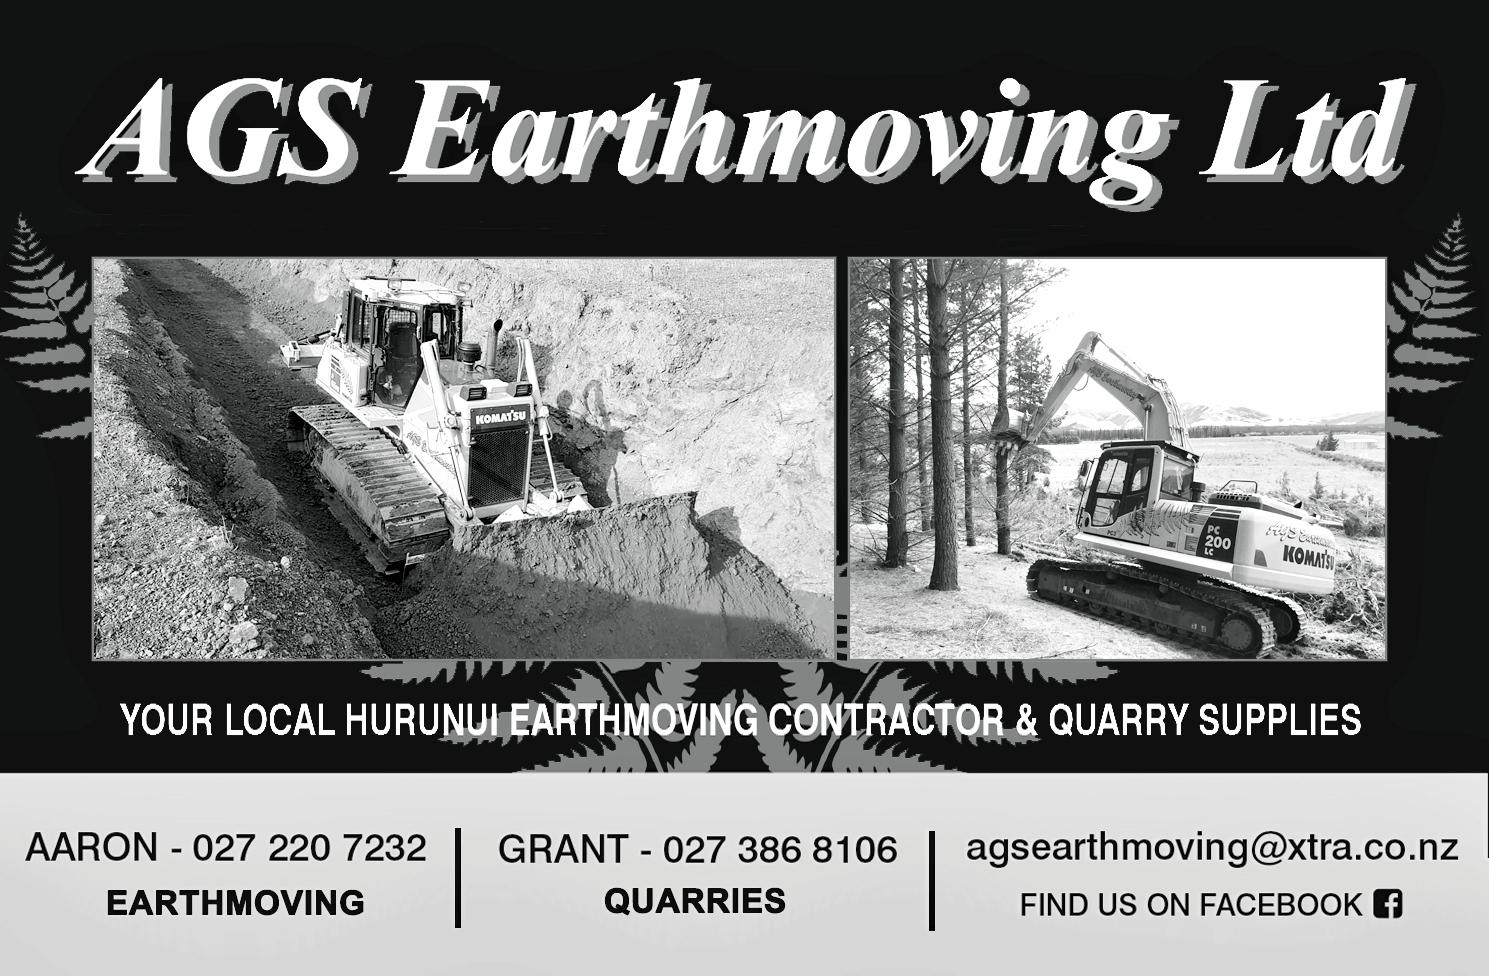 AGS Earthmoving Ltd